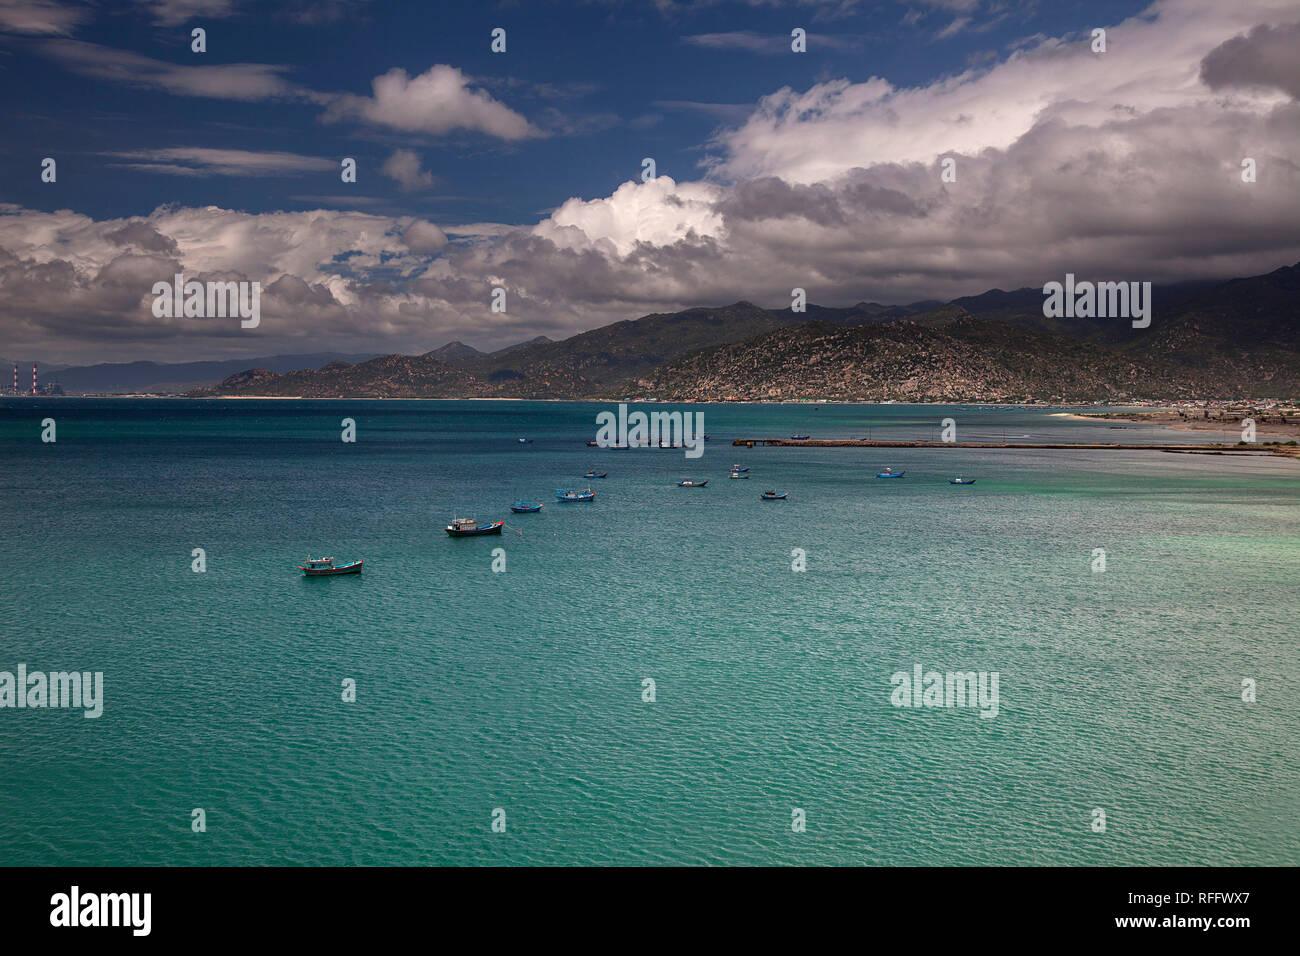 near Vinh Hy, South China Sea, Ninh Thuan, Vietnam - Stock Image